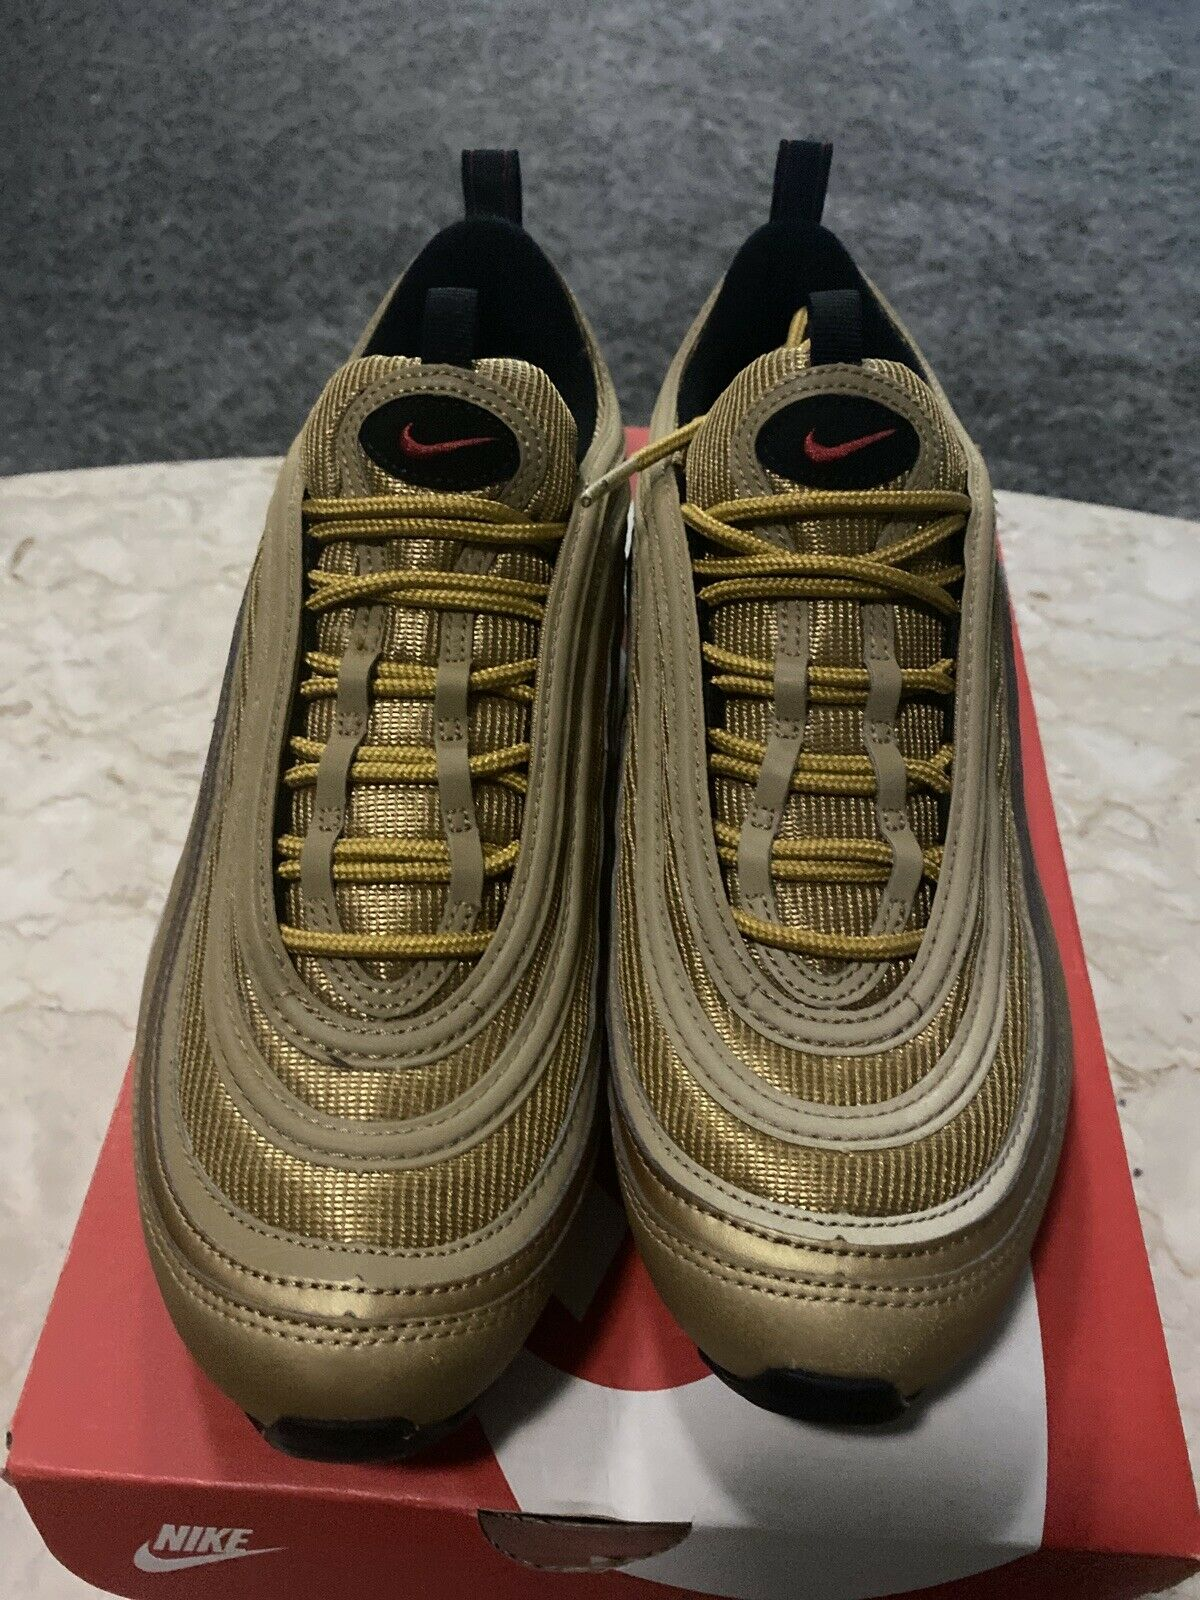 Papá barbilla cuello  Nike Air Max 97 QS Size 12.5 Metallic Silver Black/varsity Red At5458-001  for sale online | eBay